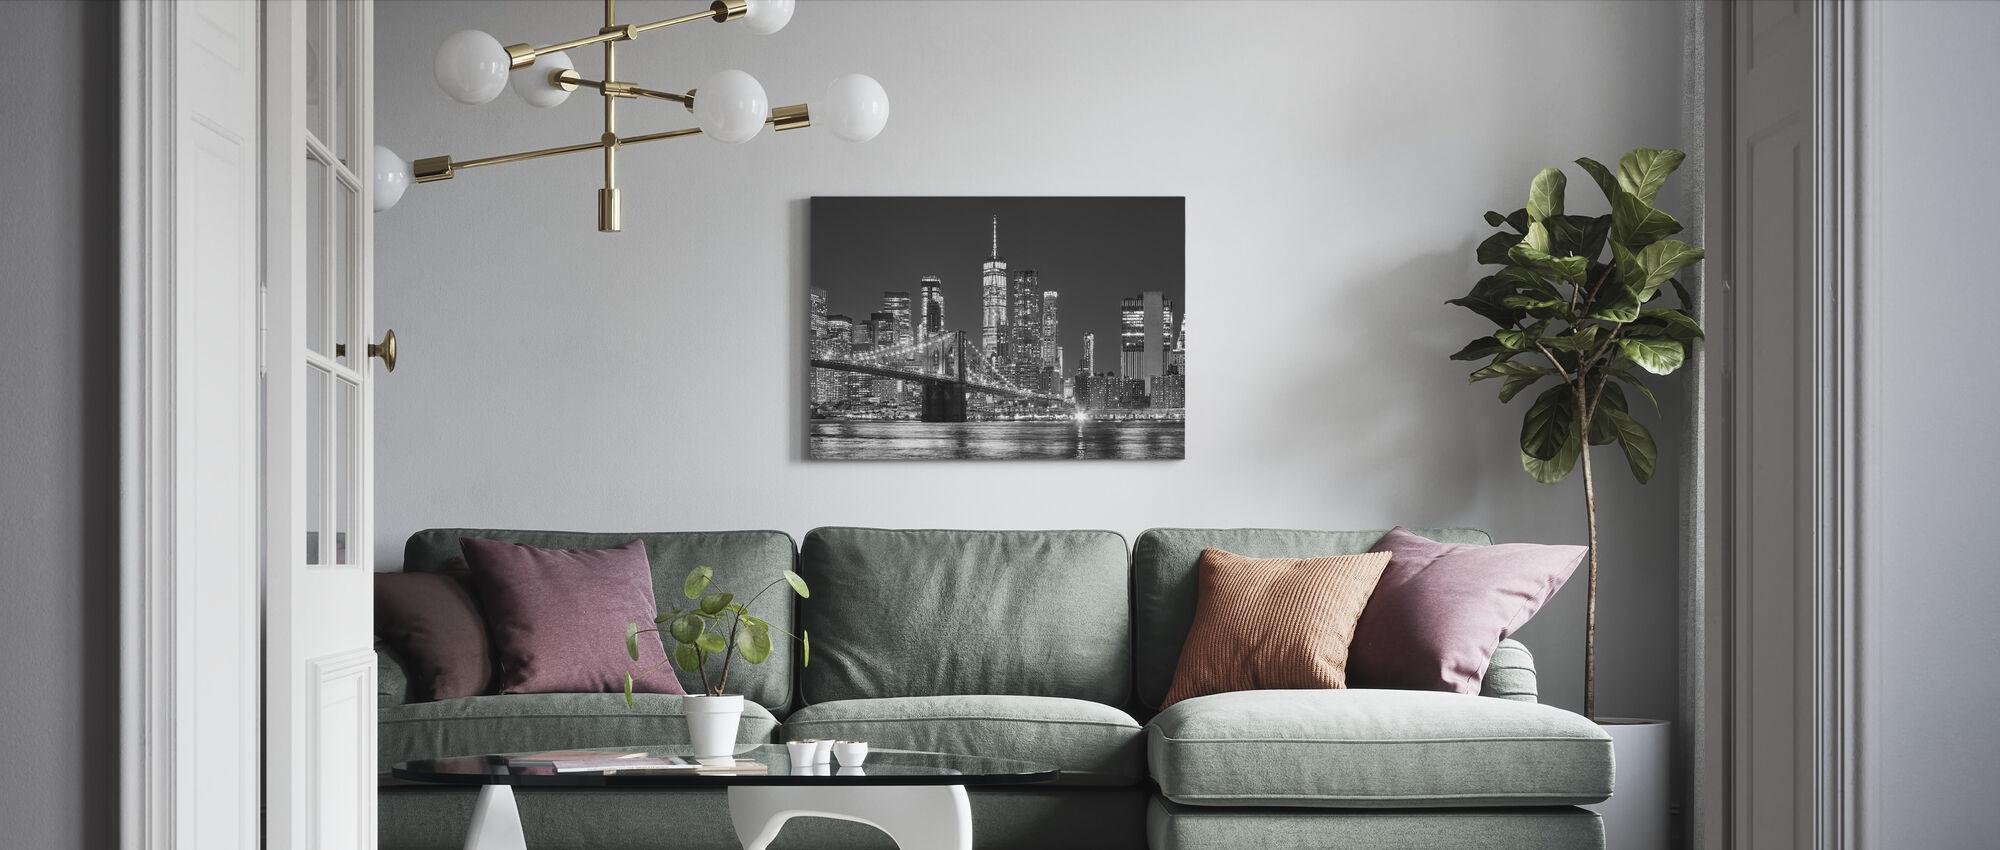 Manhattan Skyline på natten - Canvastavla - Vardagsrum